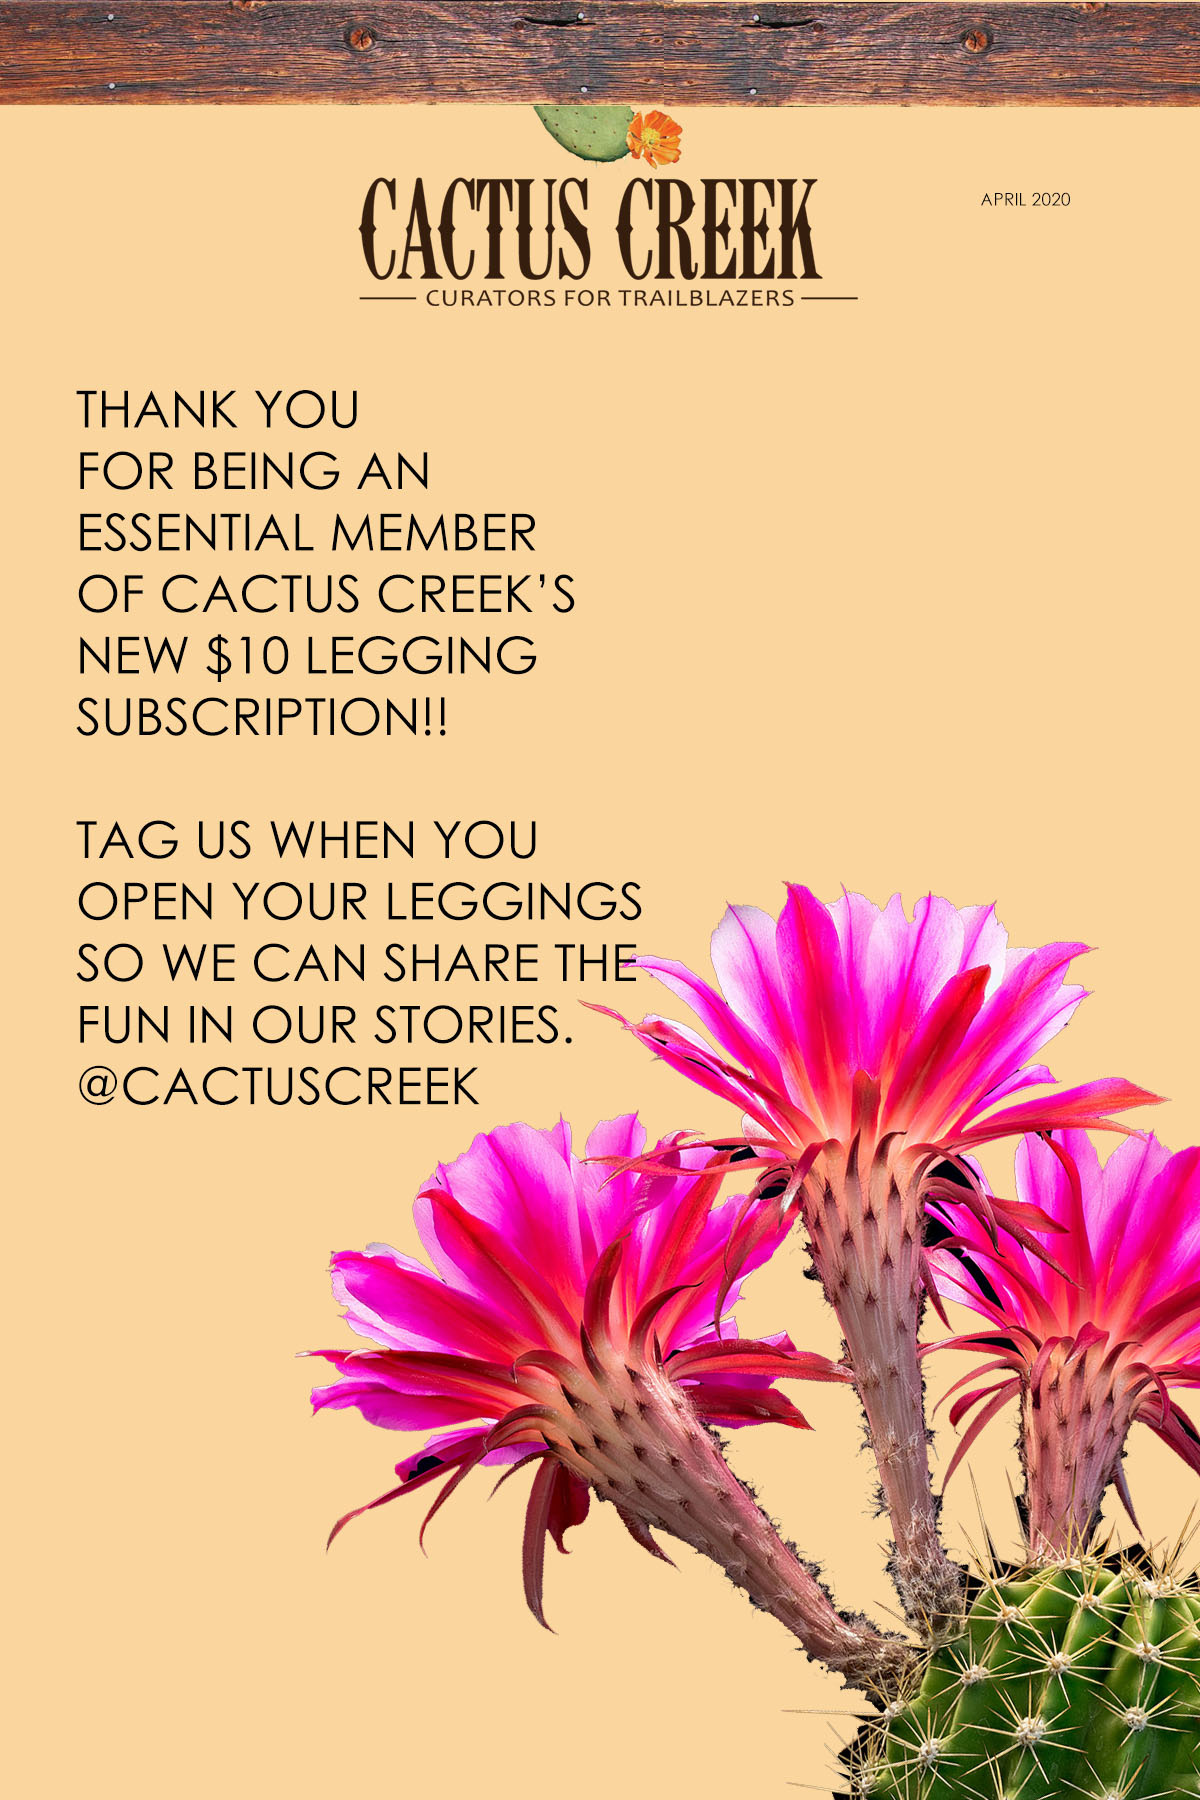 $10 Leggings Subscription Update